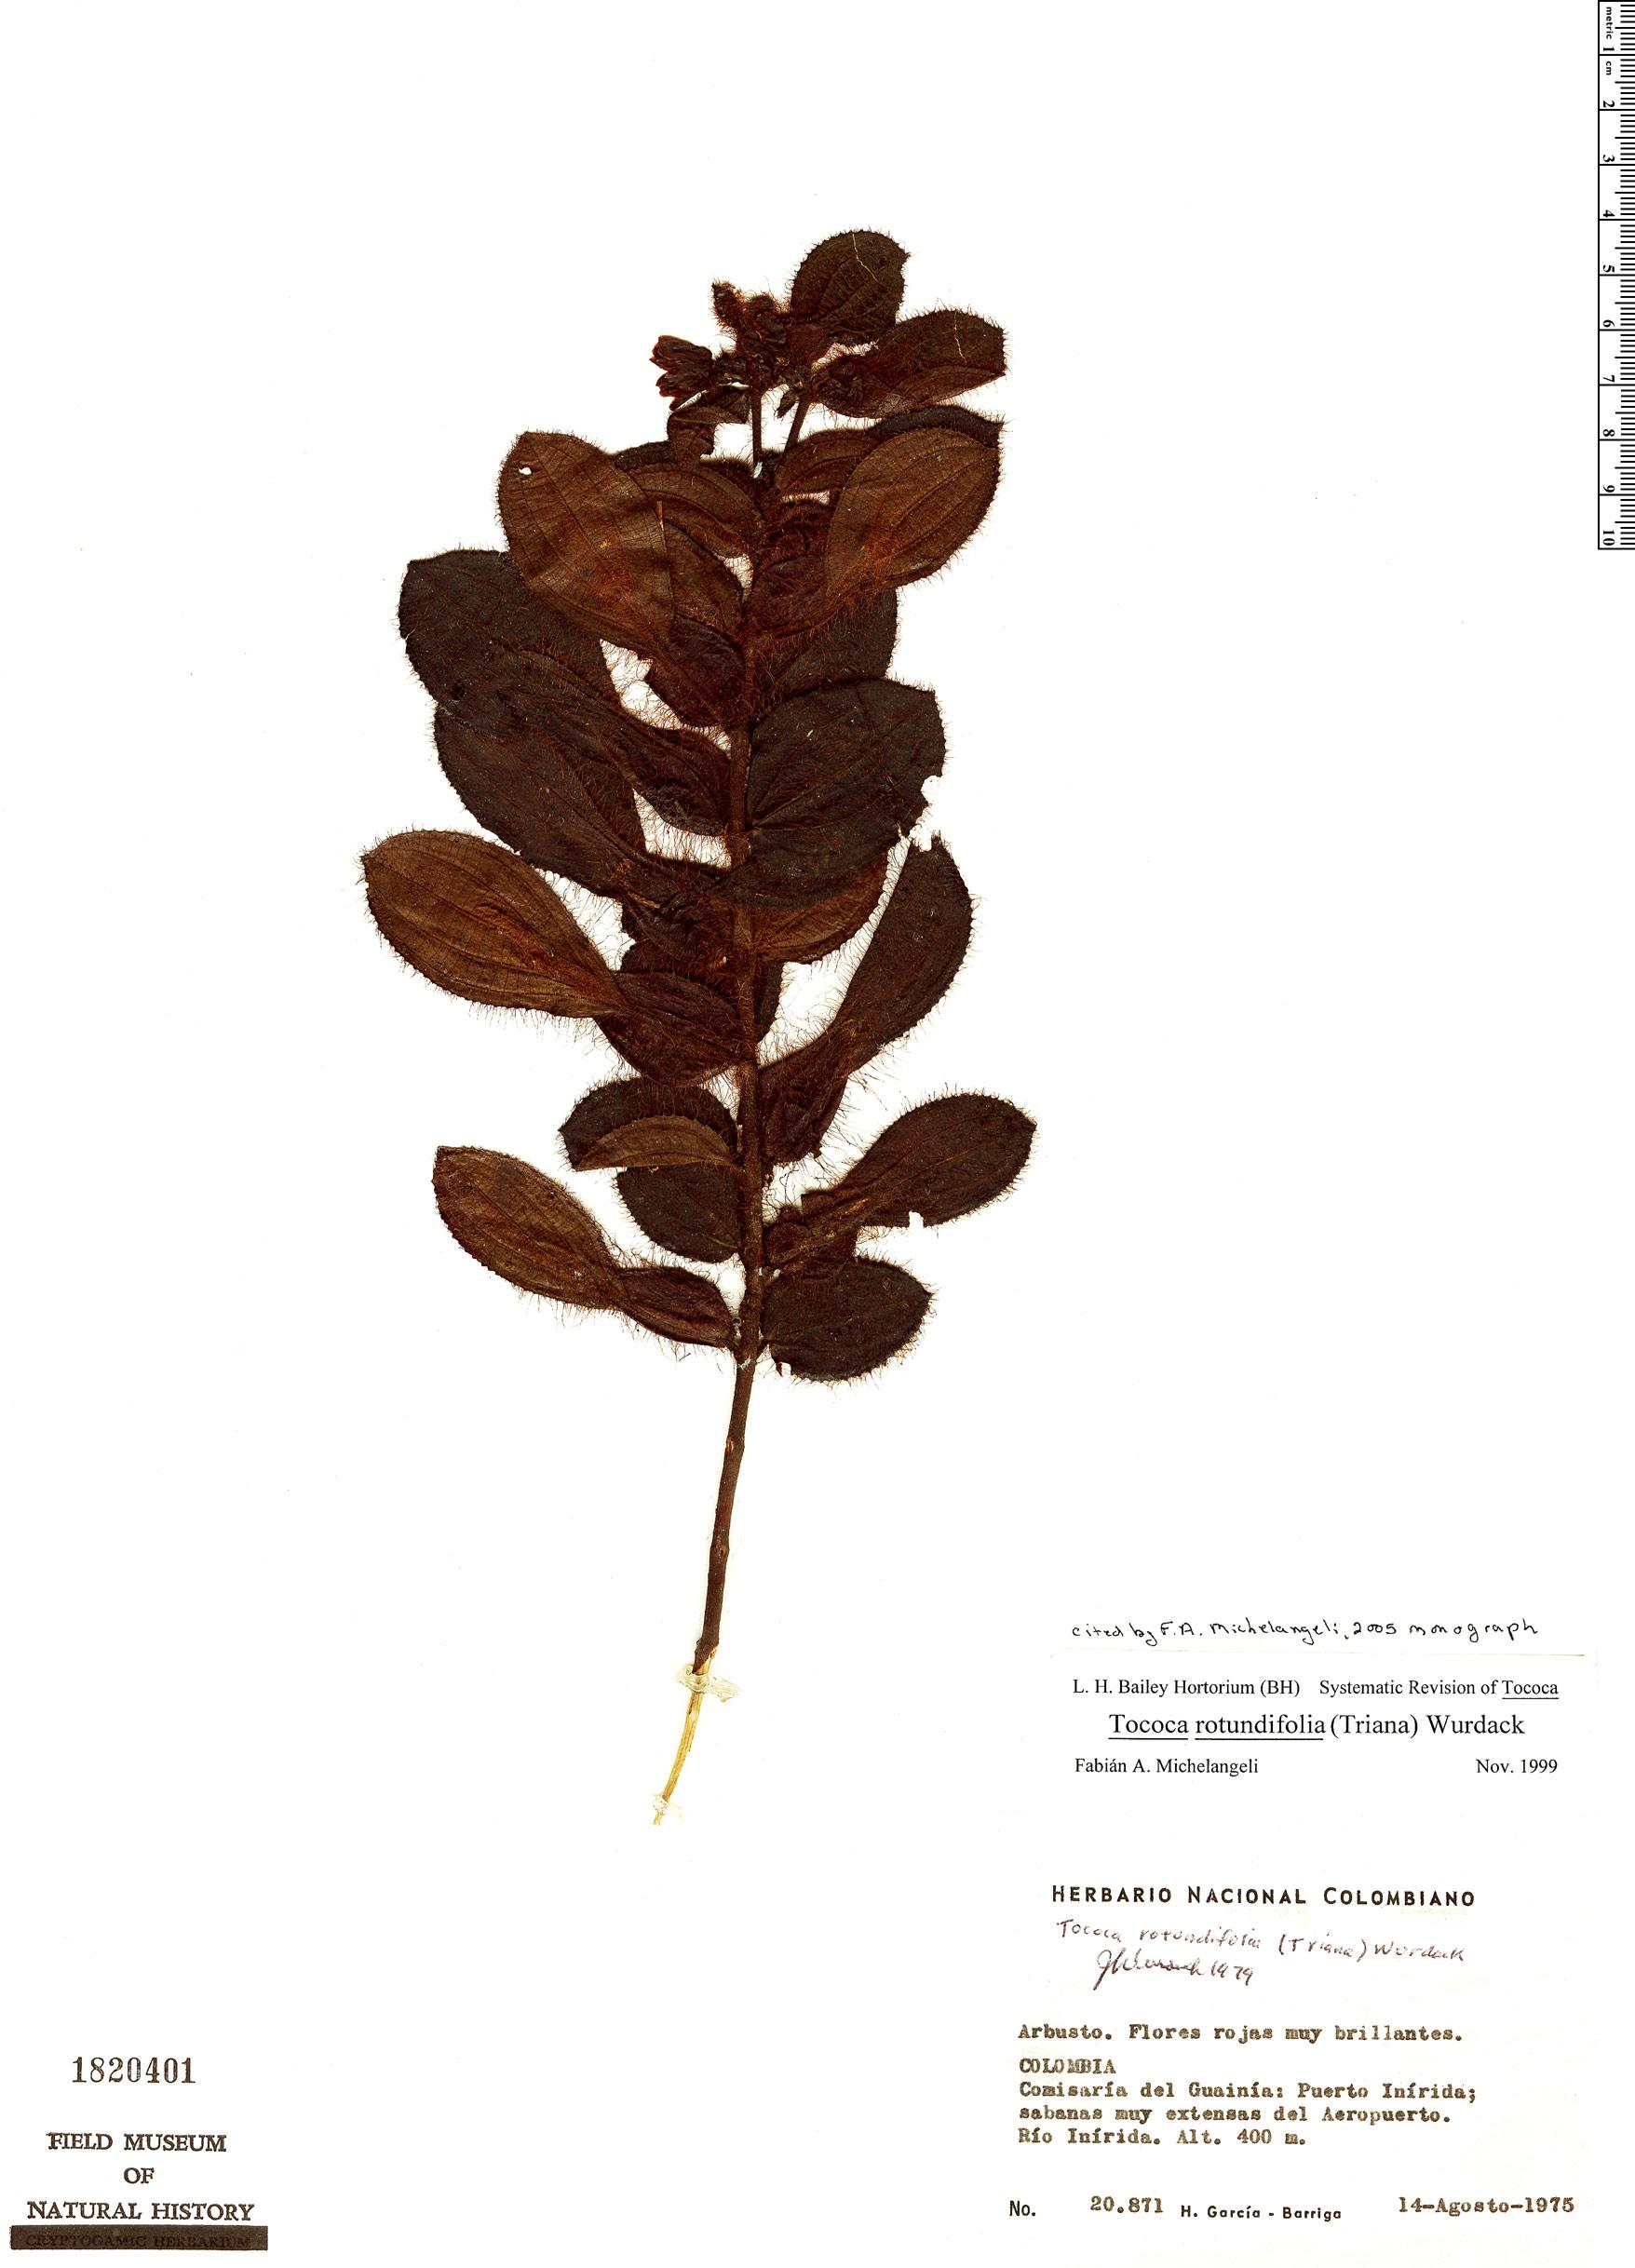 Specimen: Tococa rotundifolia